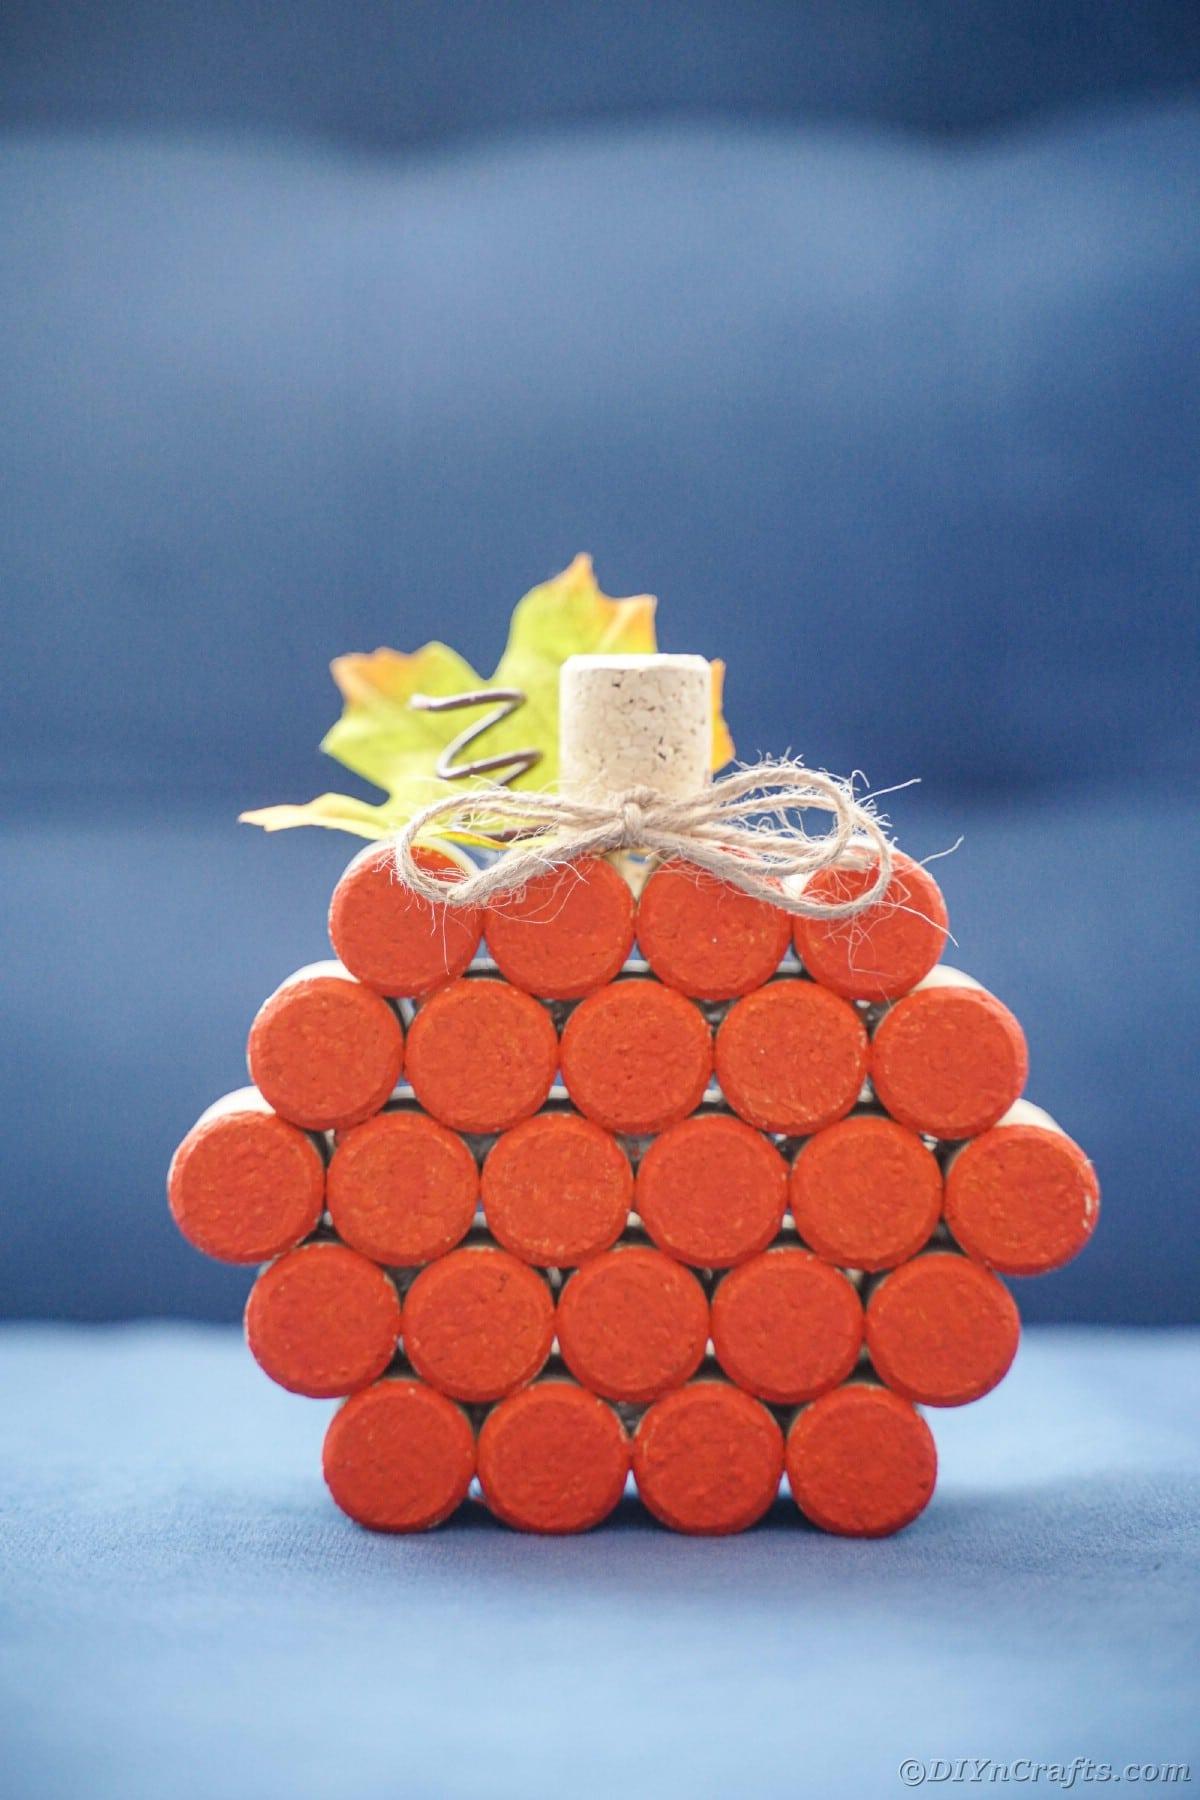 orange cork pumpkin on blue table